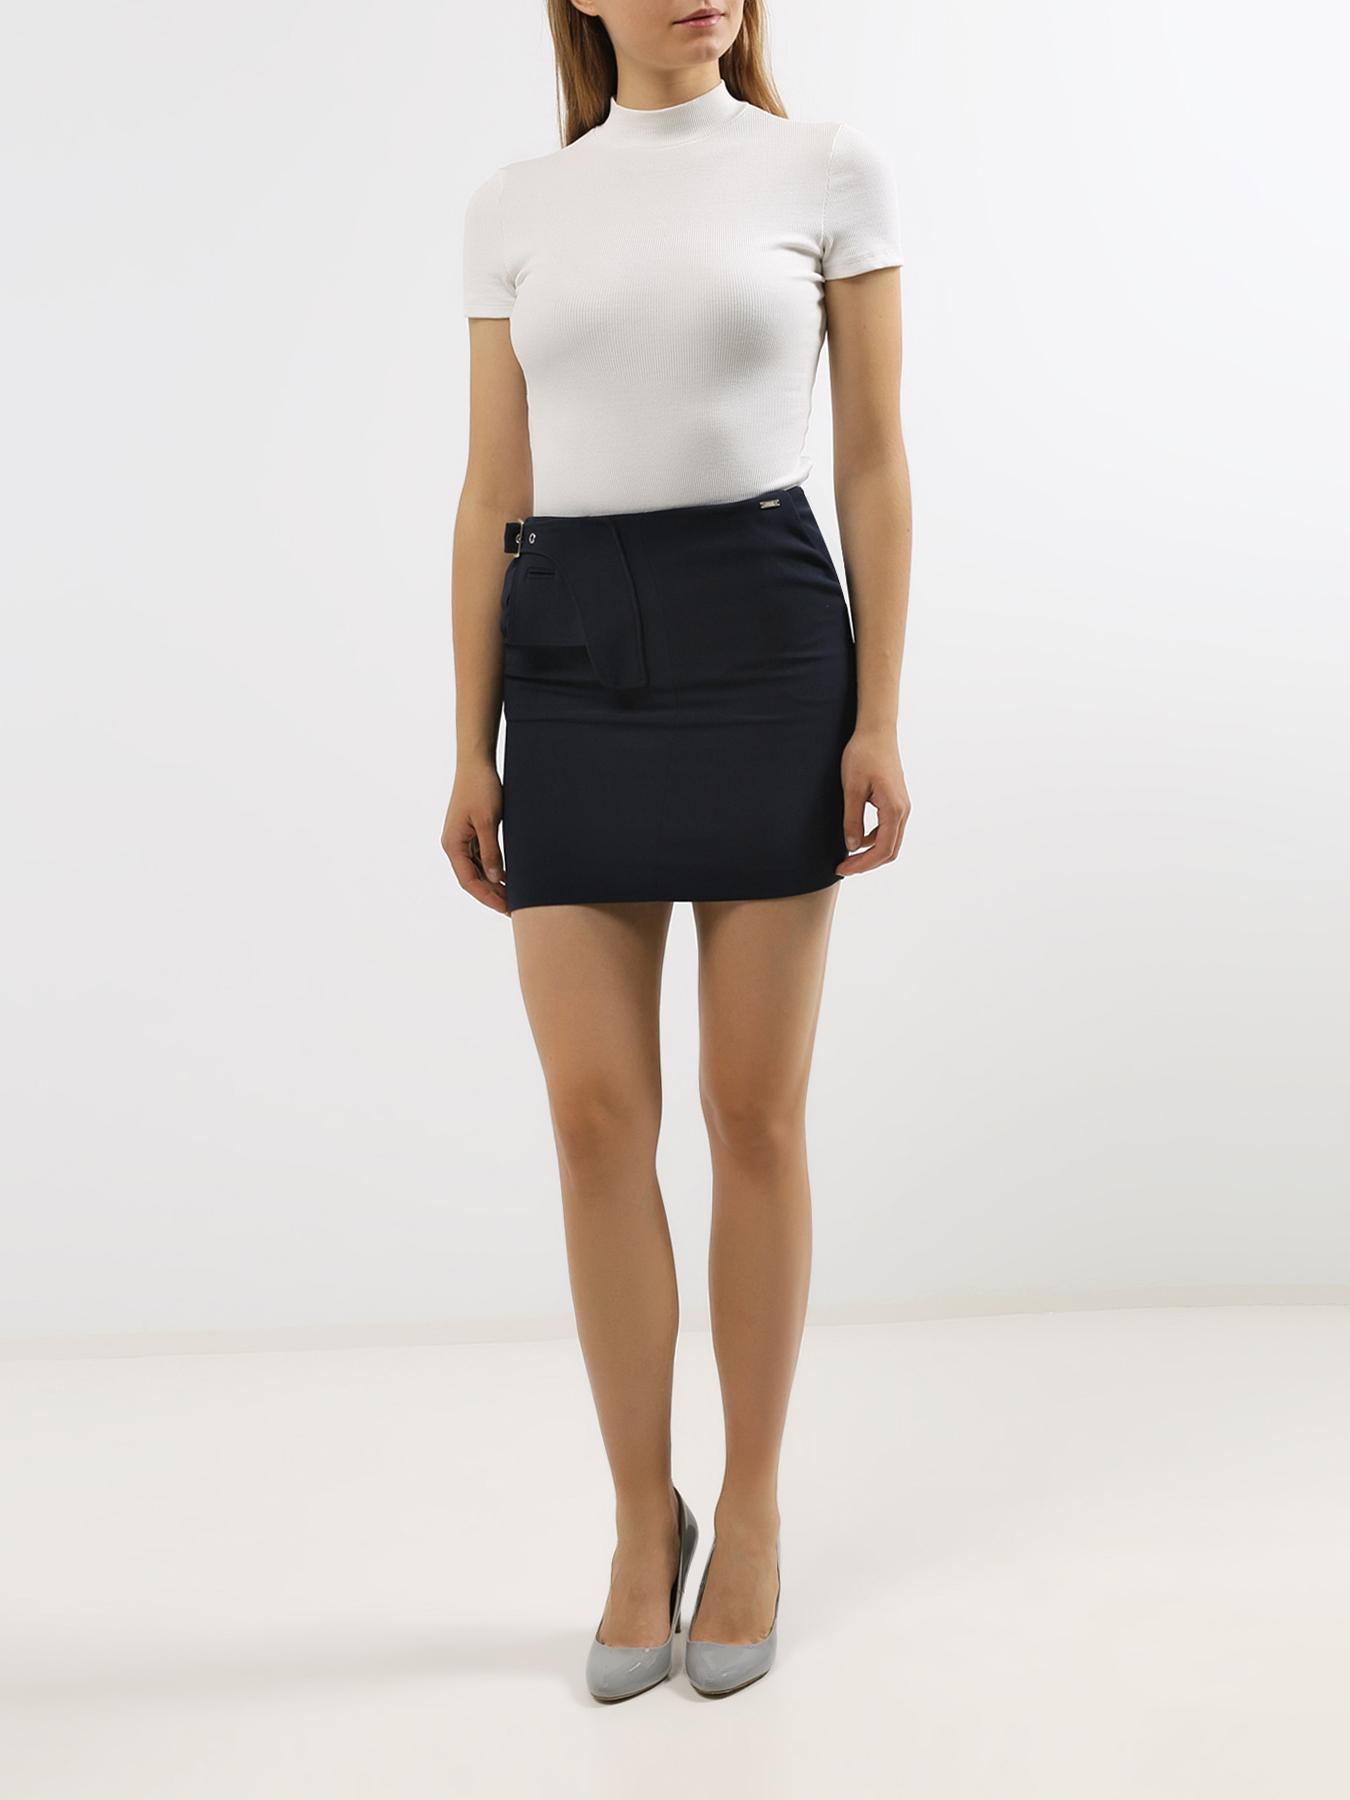 Фото - Юбка Armani Exchange Узкая юбка-мини gold case мини юбка